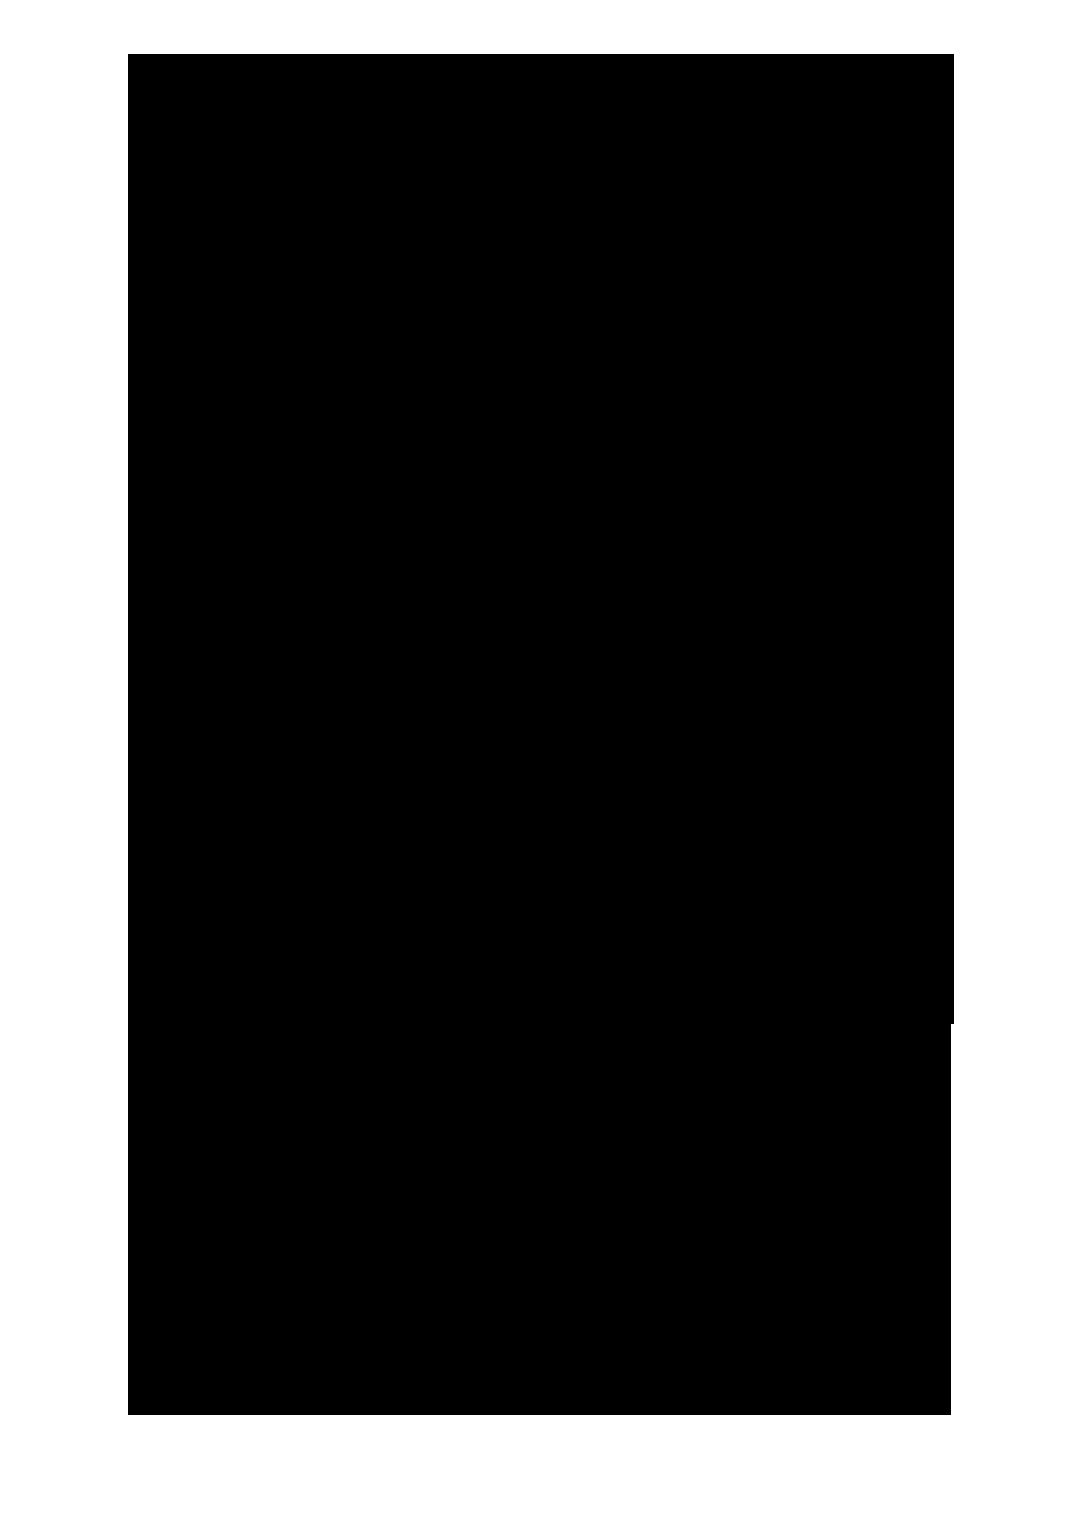 inpo-01